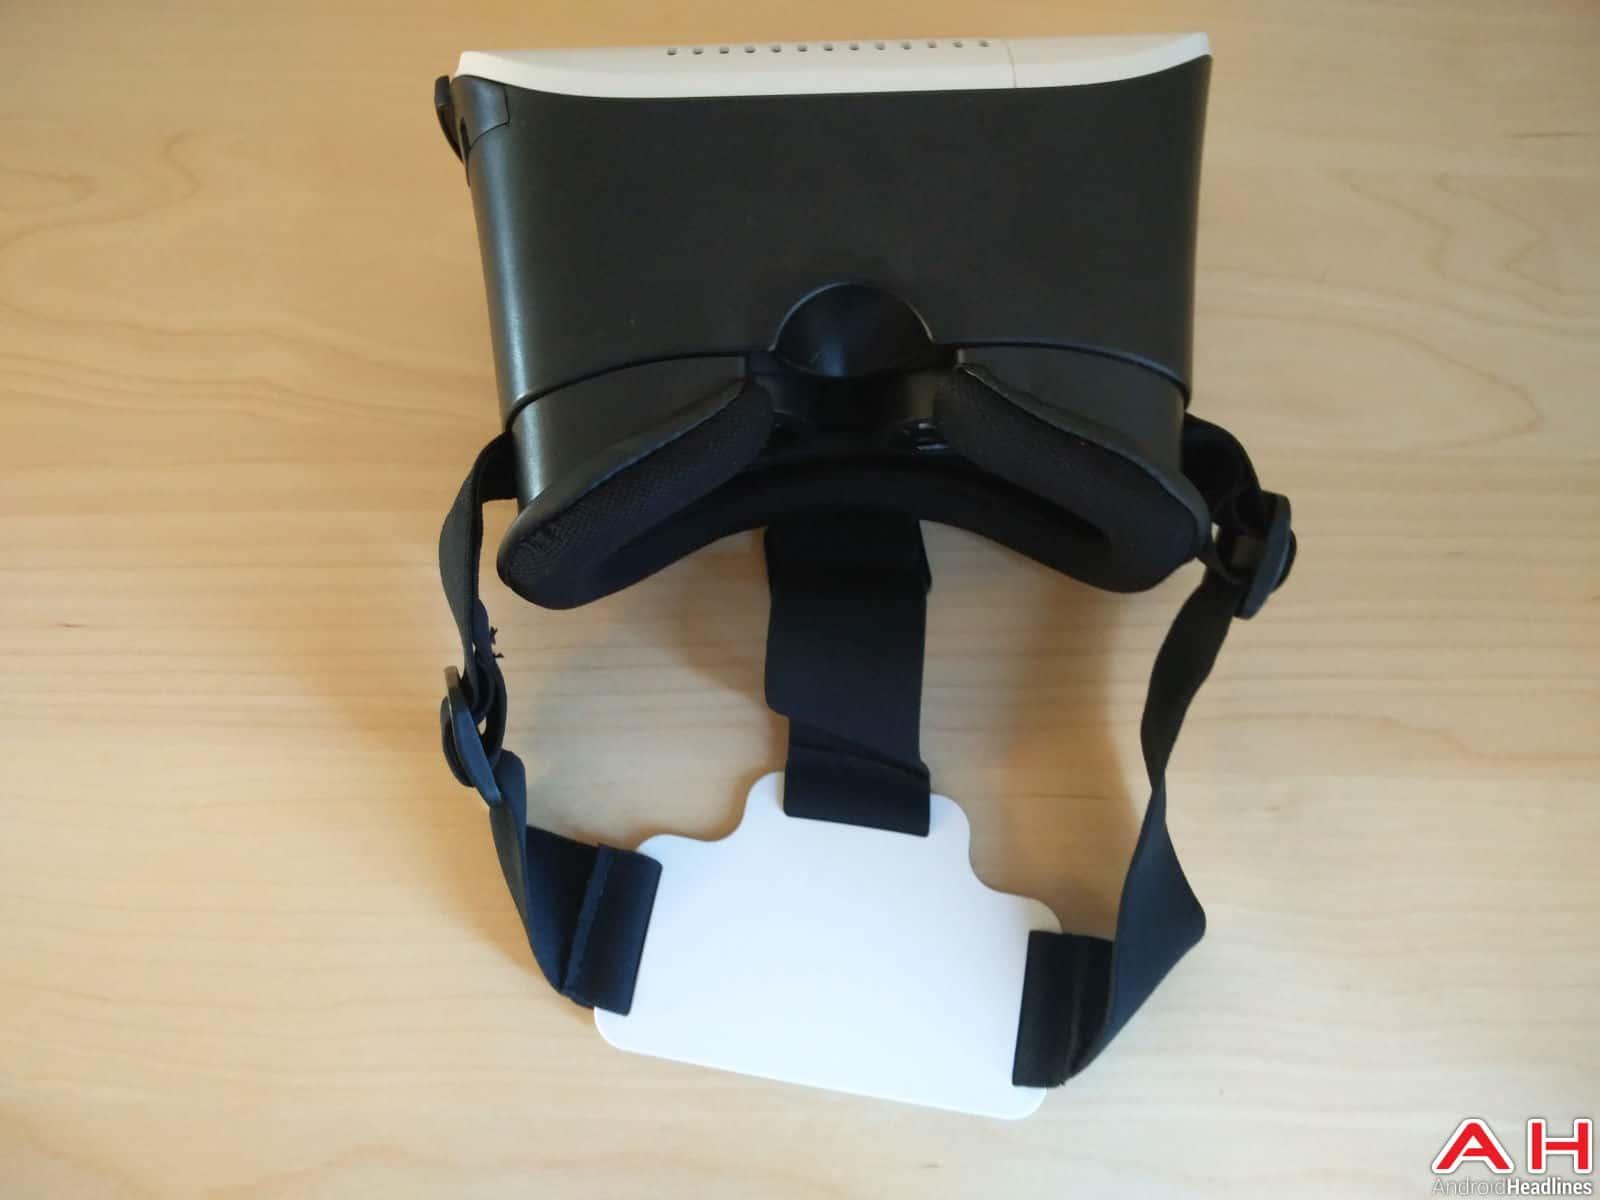 INNORI Virtual Reality Headset-6